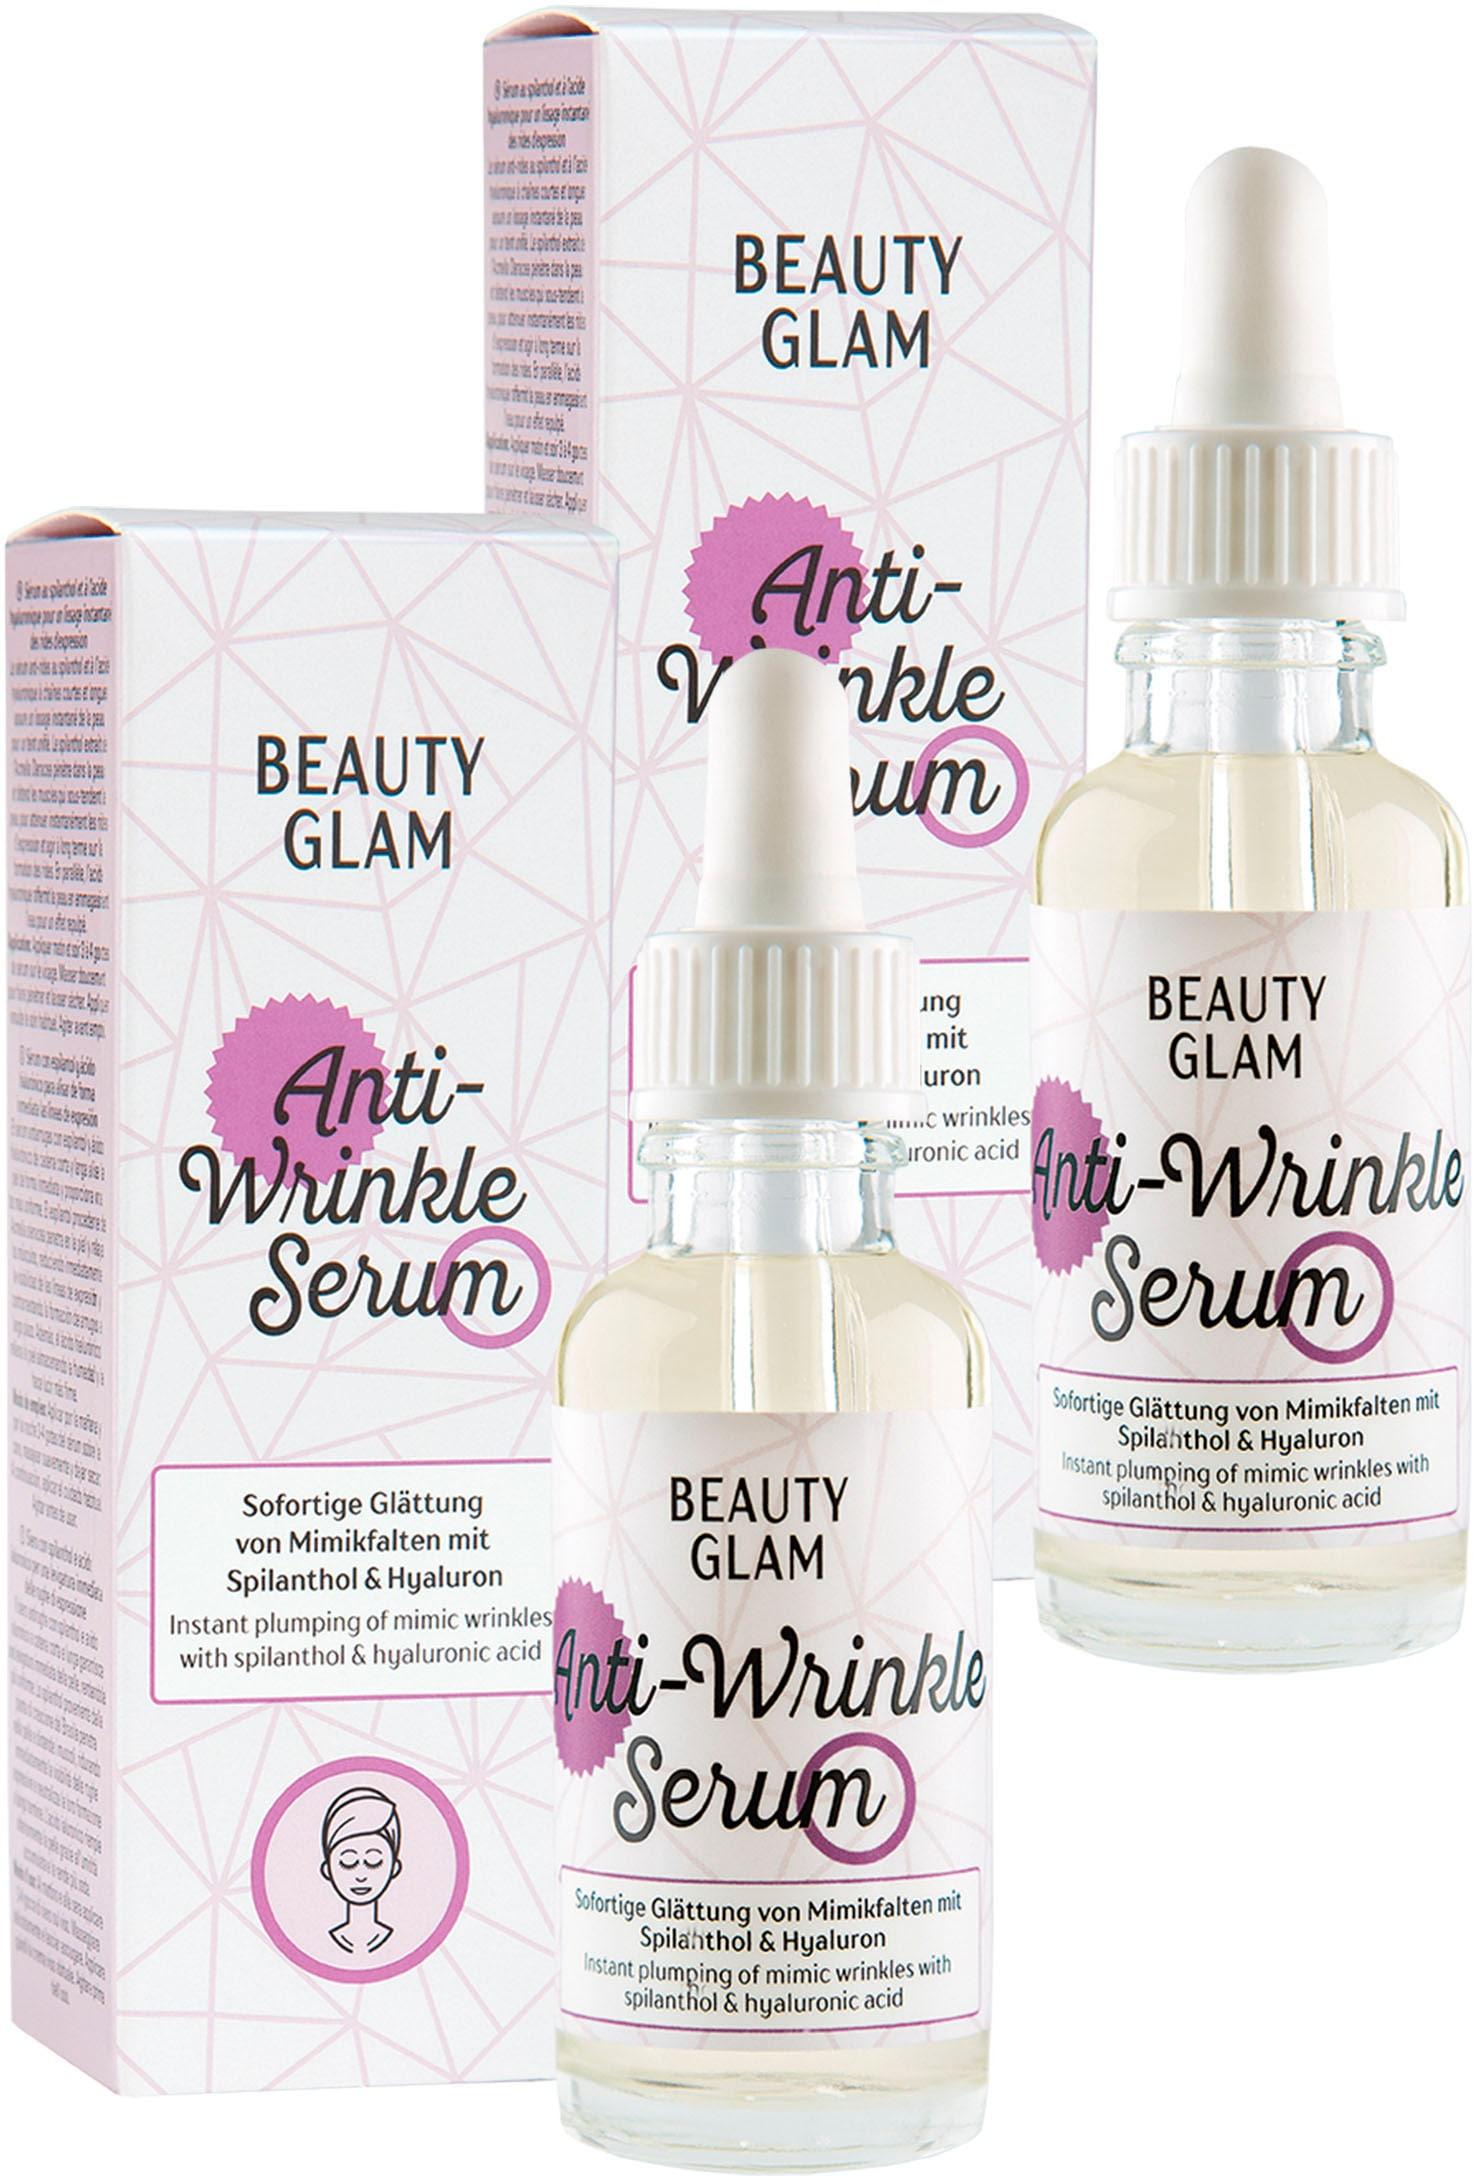 beauty glam -  Gesichtspflege-Set Anti-Wrinkle Serum, (2 tlg.)